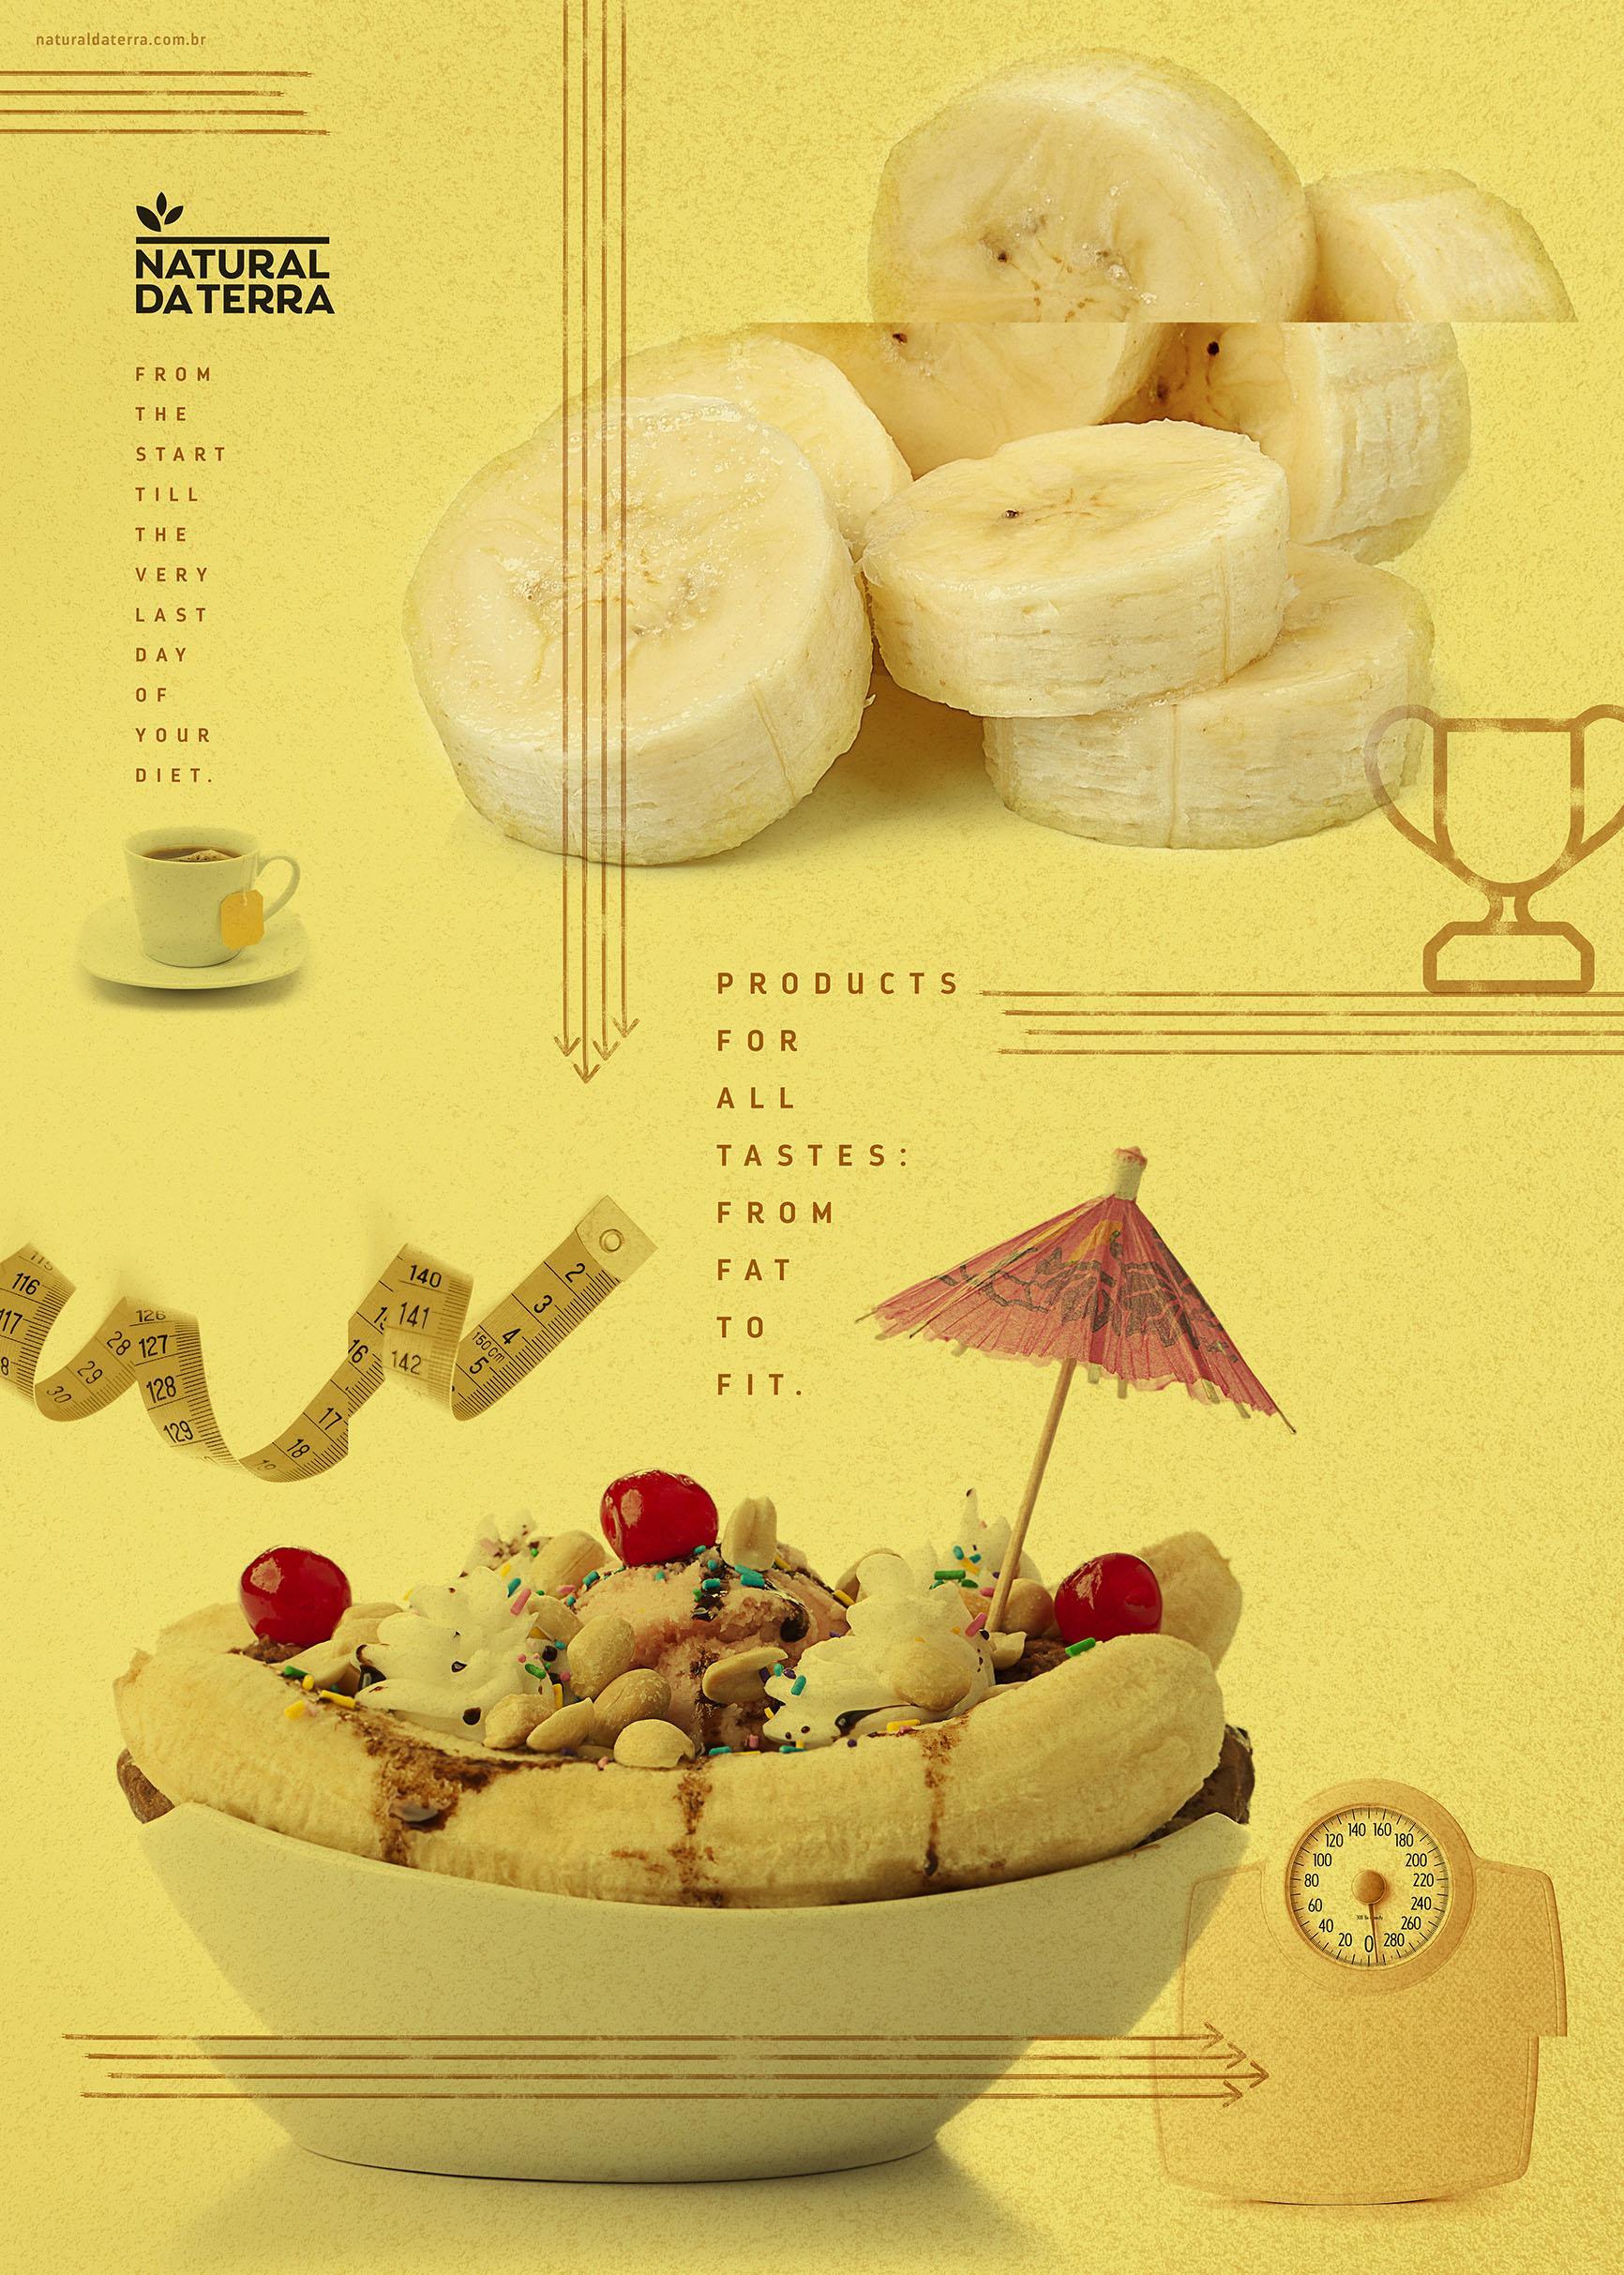 Natural da Terra Print Ad - Diet - Banana